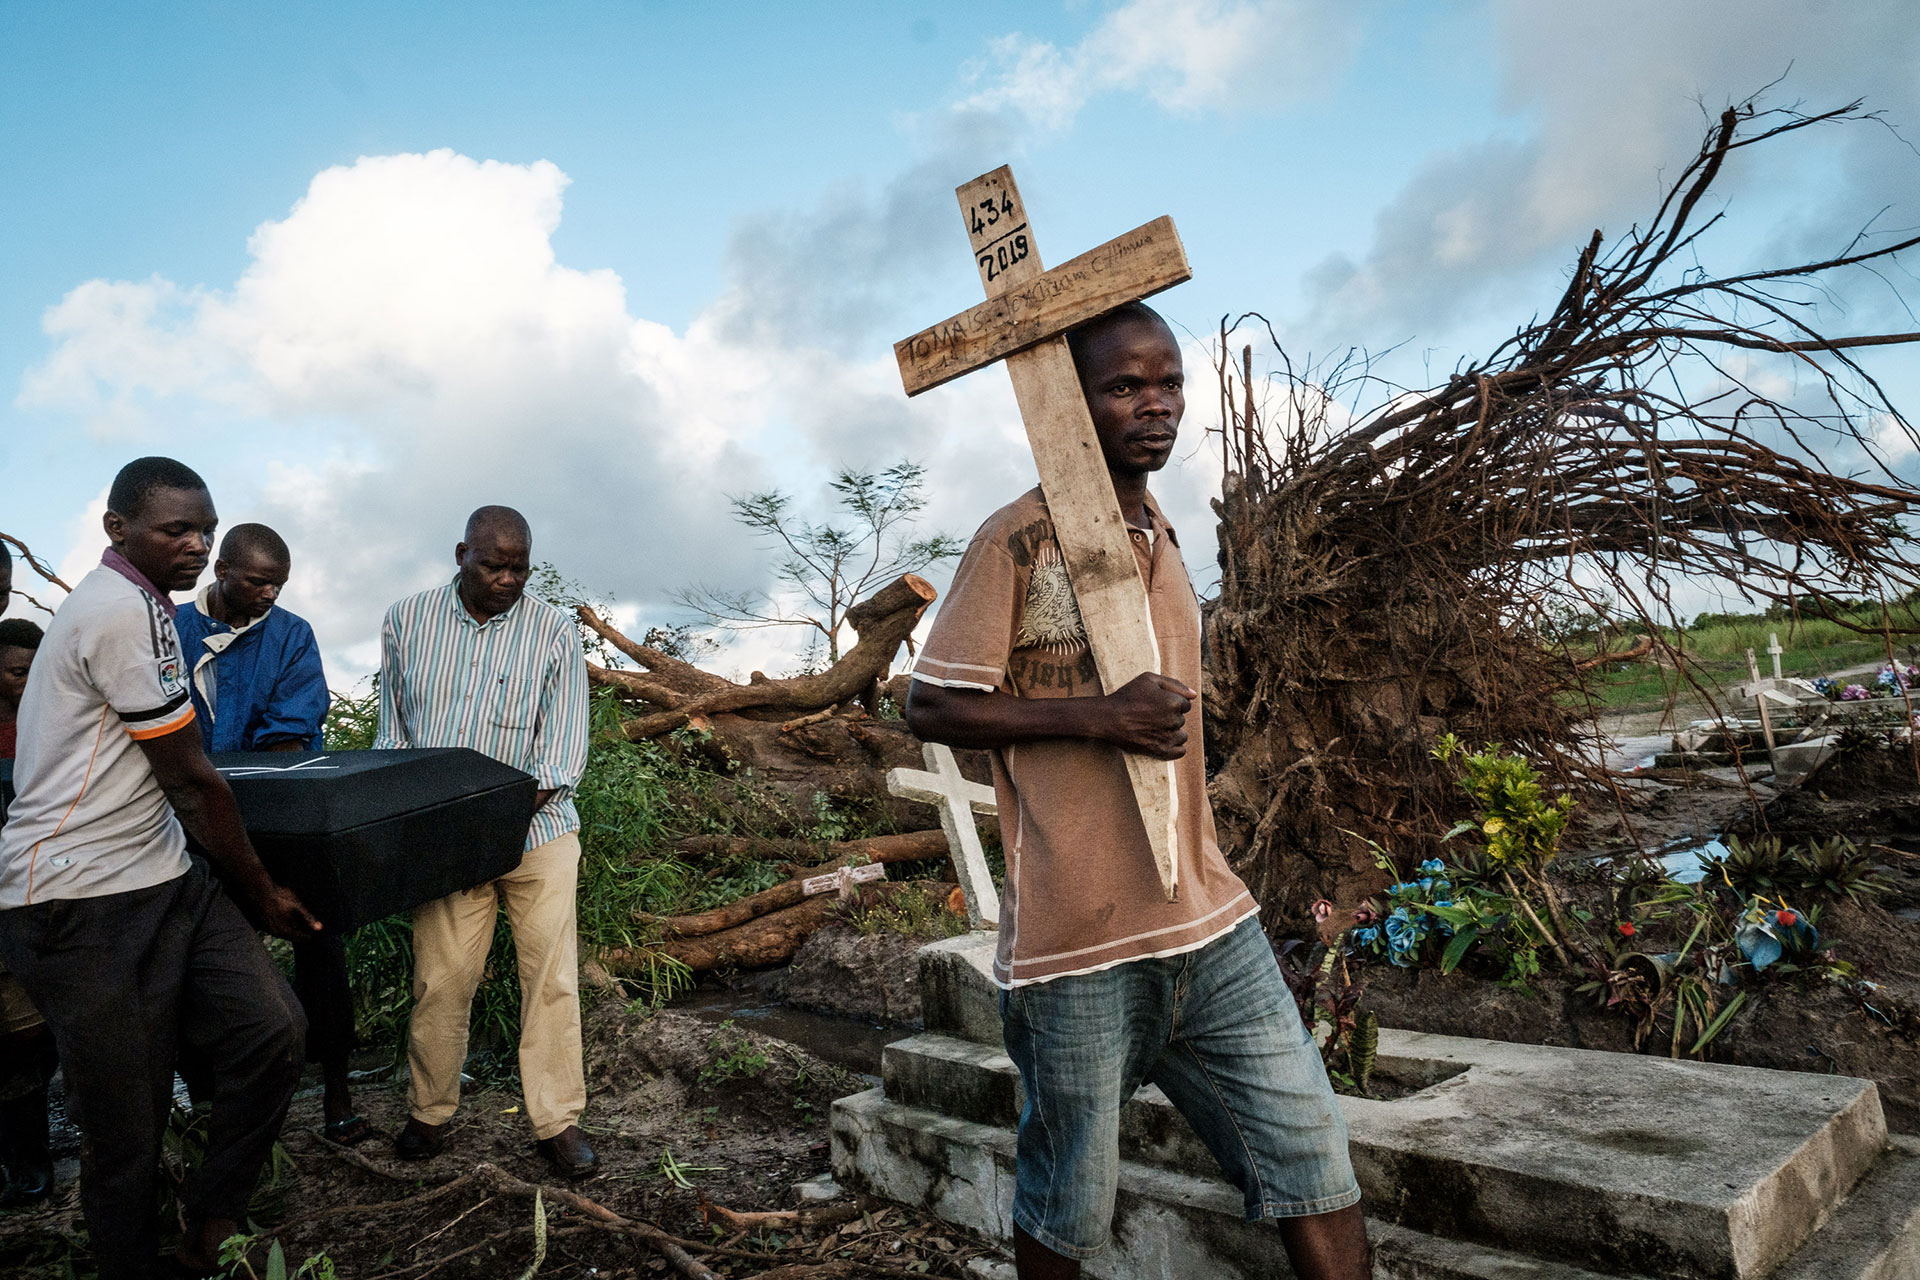 El funeral de Tomas Joaquim Chimukme luego de que colapsara su casaenBeira, Mozambique. (Foto: Yasuyoshi CHIBA / AFP)